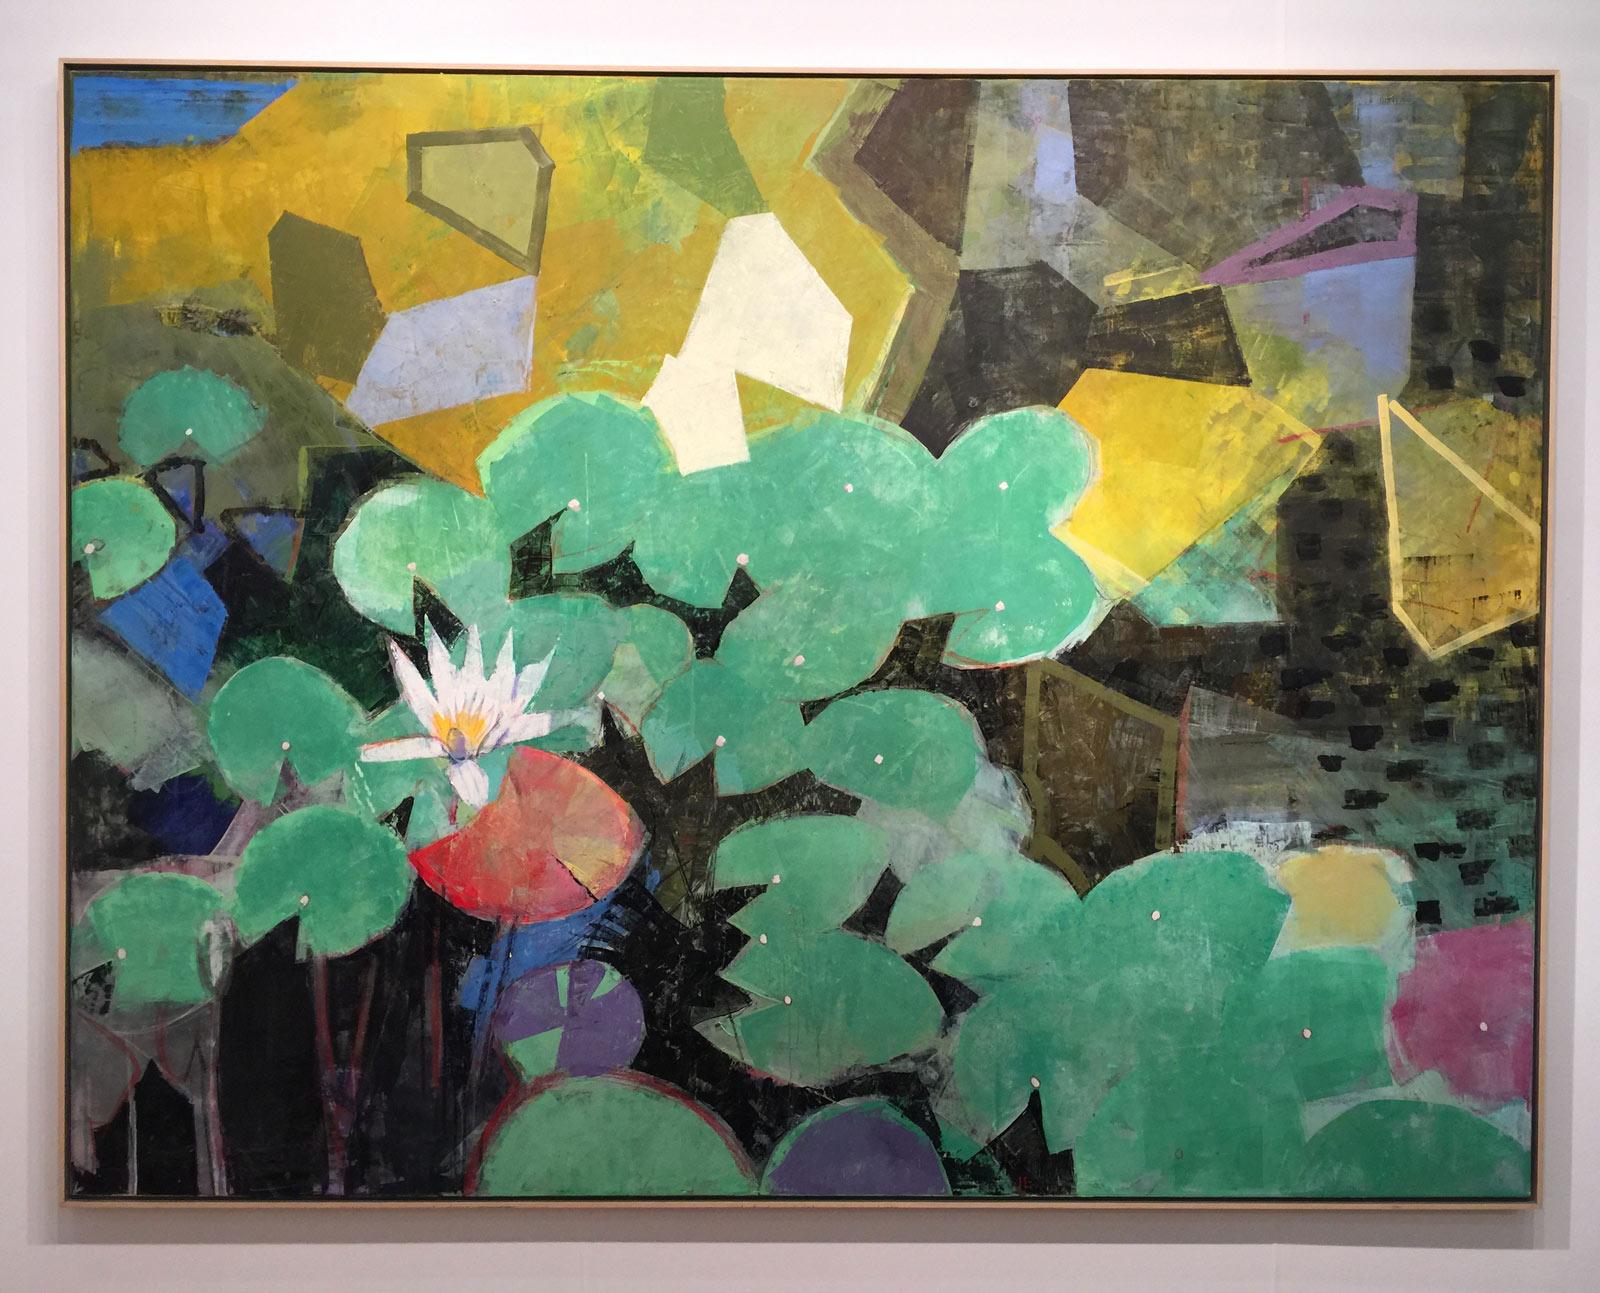 John-Evans-Monument-oil-canvas-Gallery-Henoch.jpg